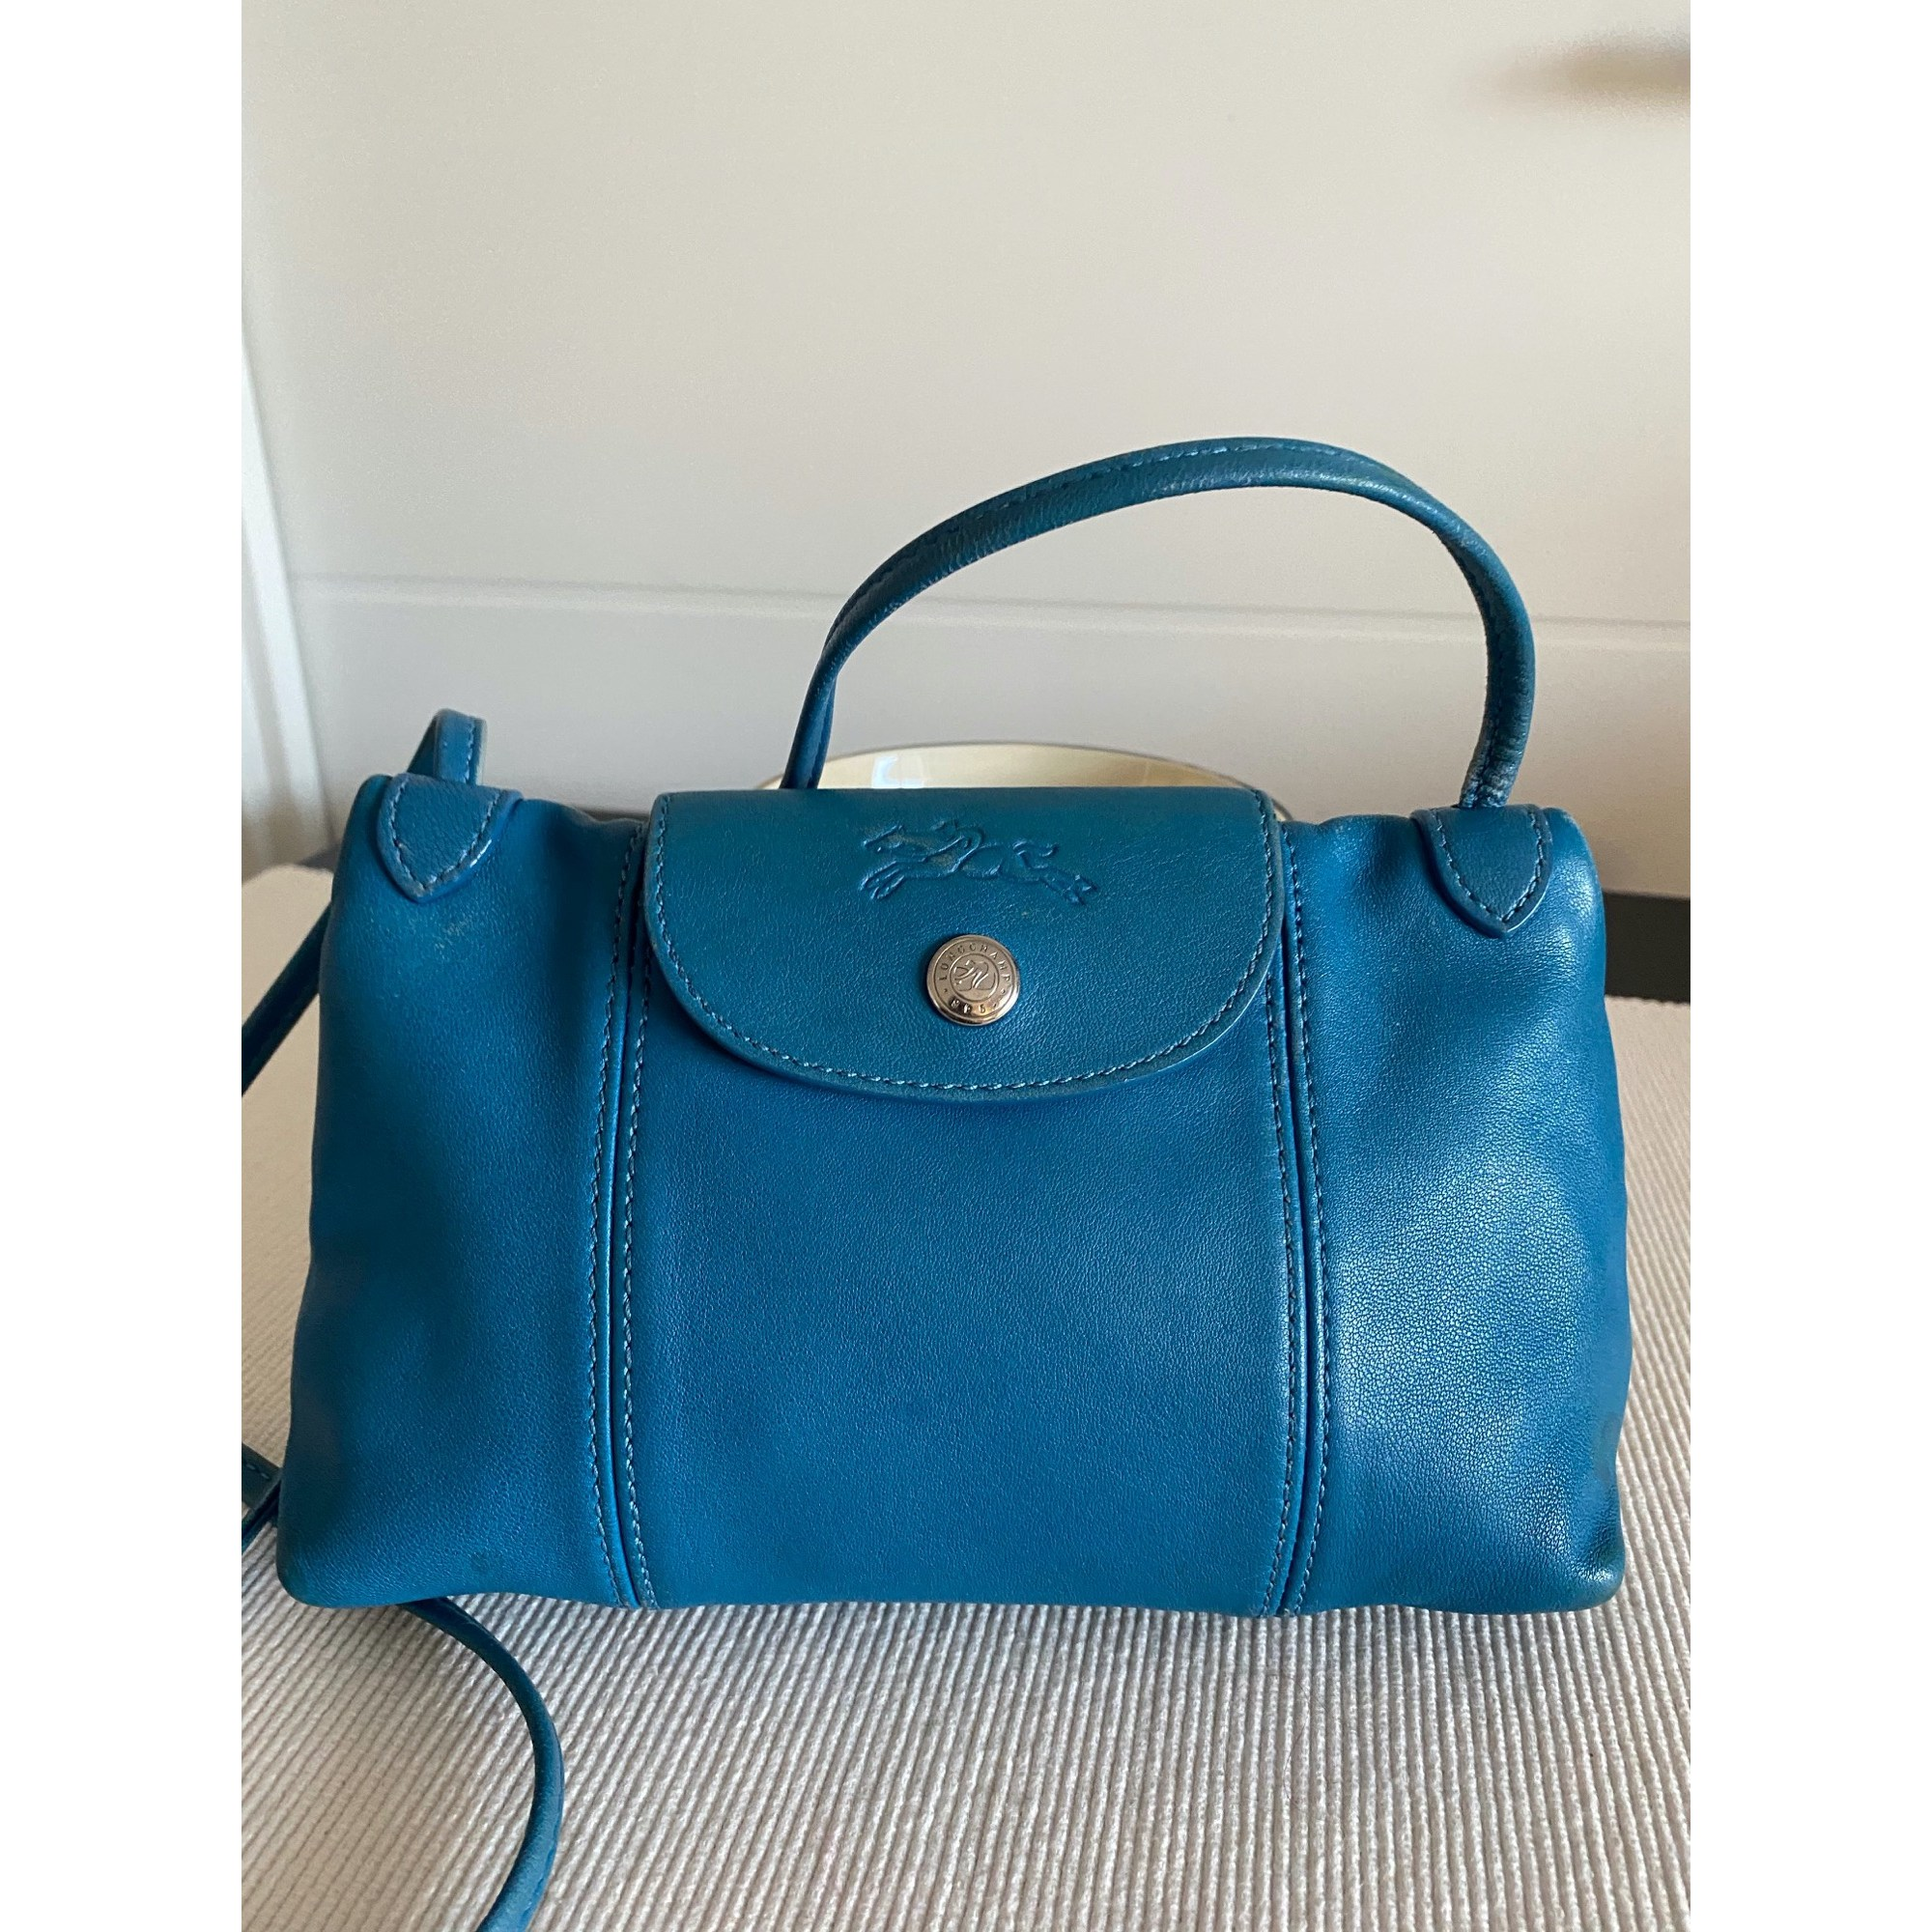 Sac en bandoulière en cuir LONGCHAMP Pliage Bleu, bleu marine, bleu turquoise